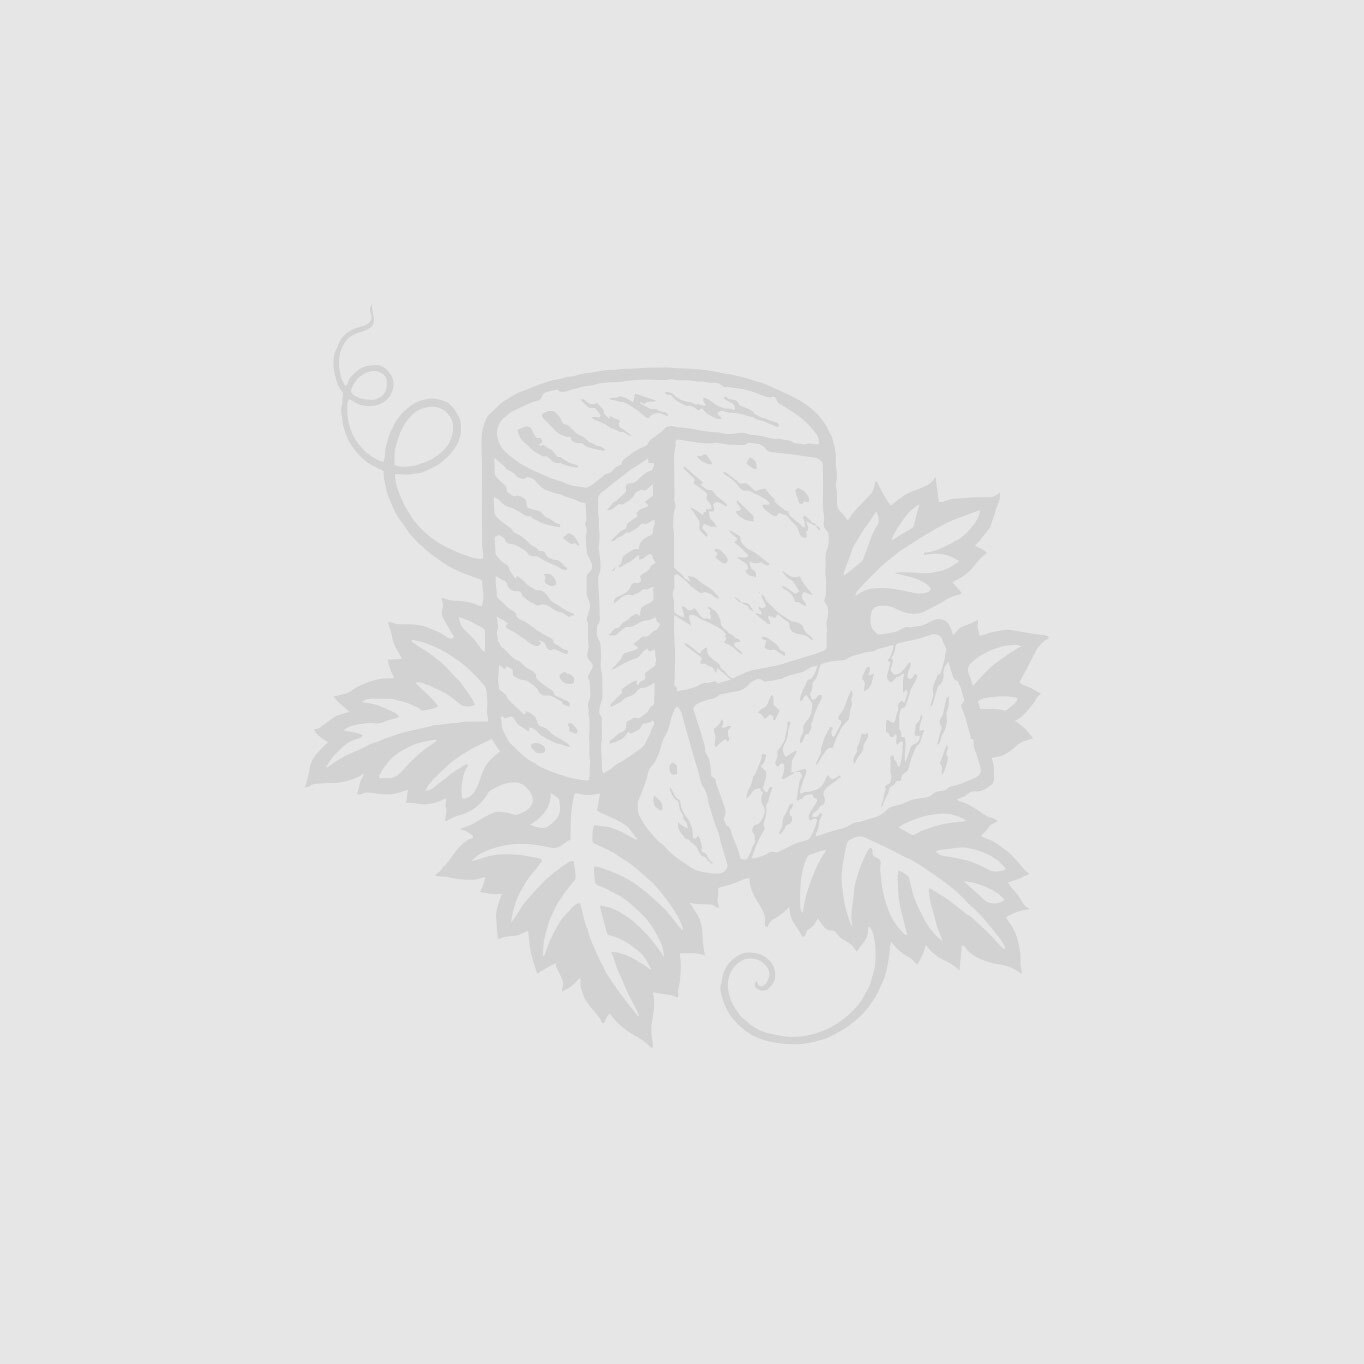 5 x Grate Britain Stilton Crackers Pouches - For 'Grab & Go'